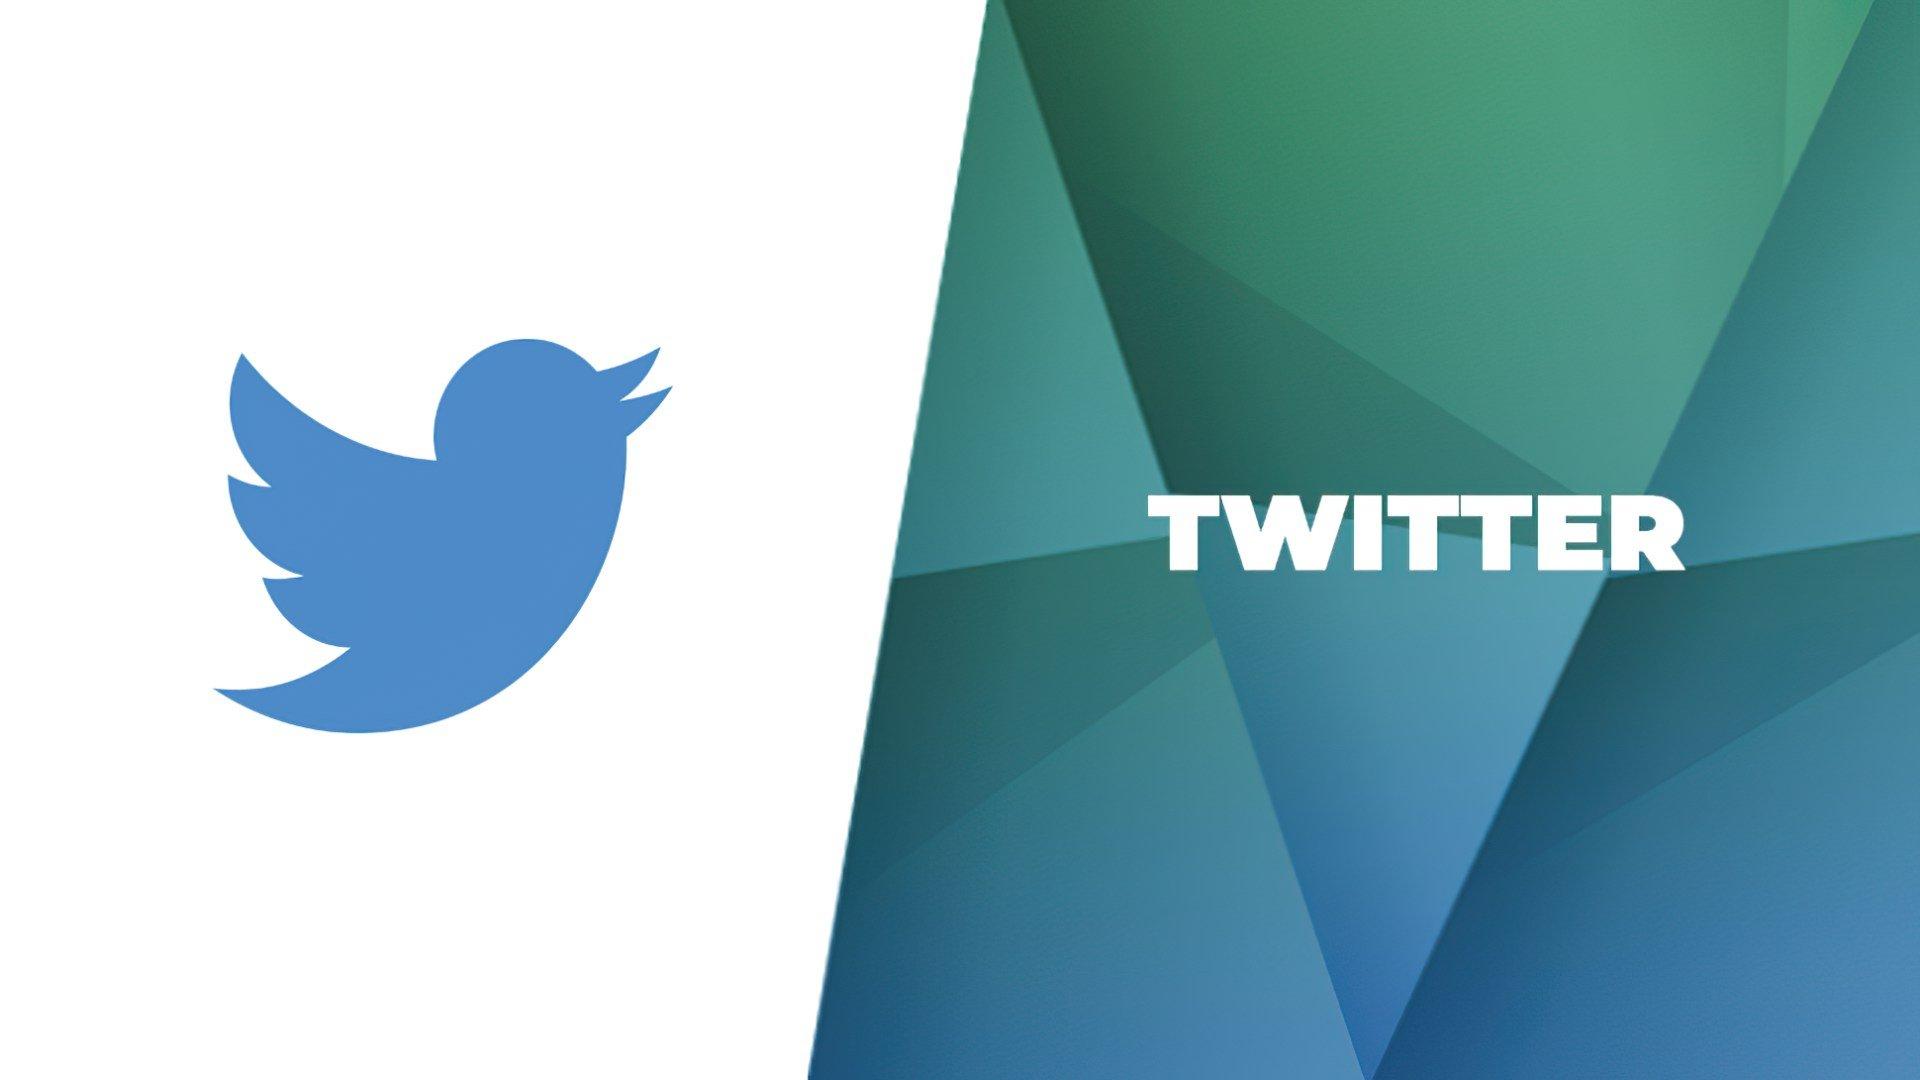 Internet, App, Social Network, Messenger, soziales Netzwerk, Chat, Twitter, Social Media, Tweet, 739699, Vogel